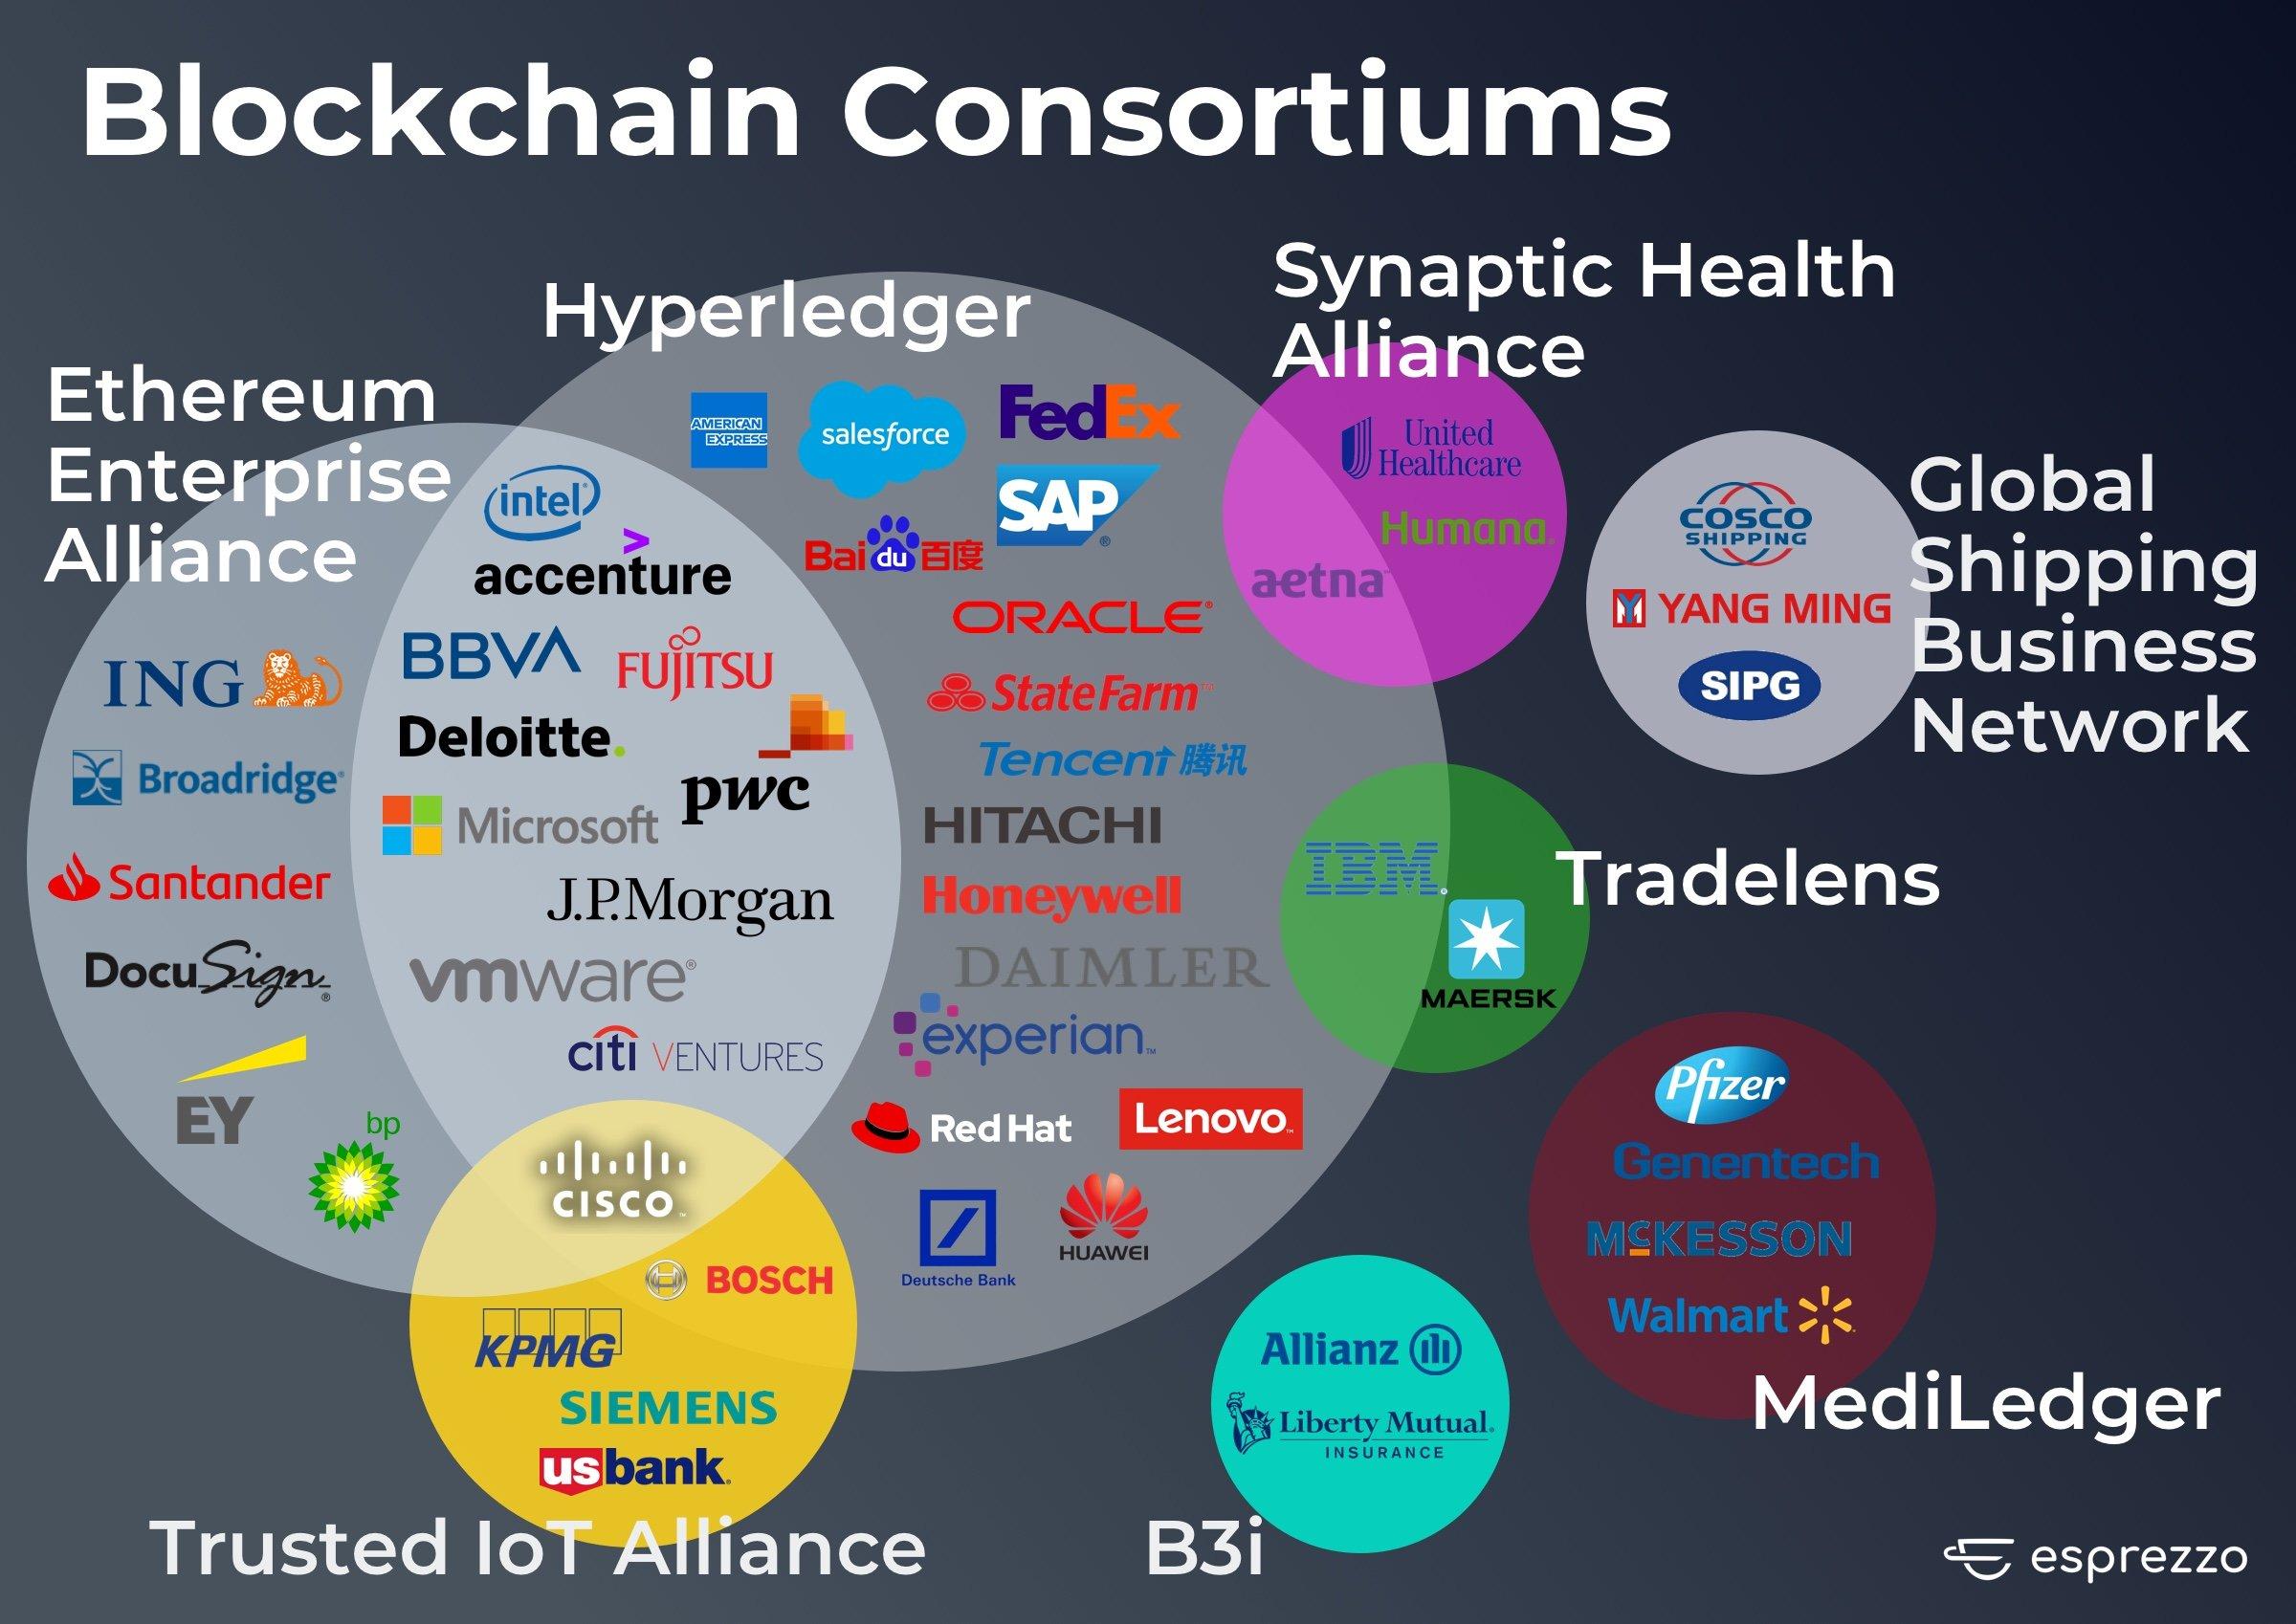 blockchain consortiums infographic by Esprezzo2x